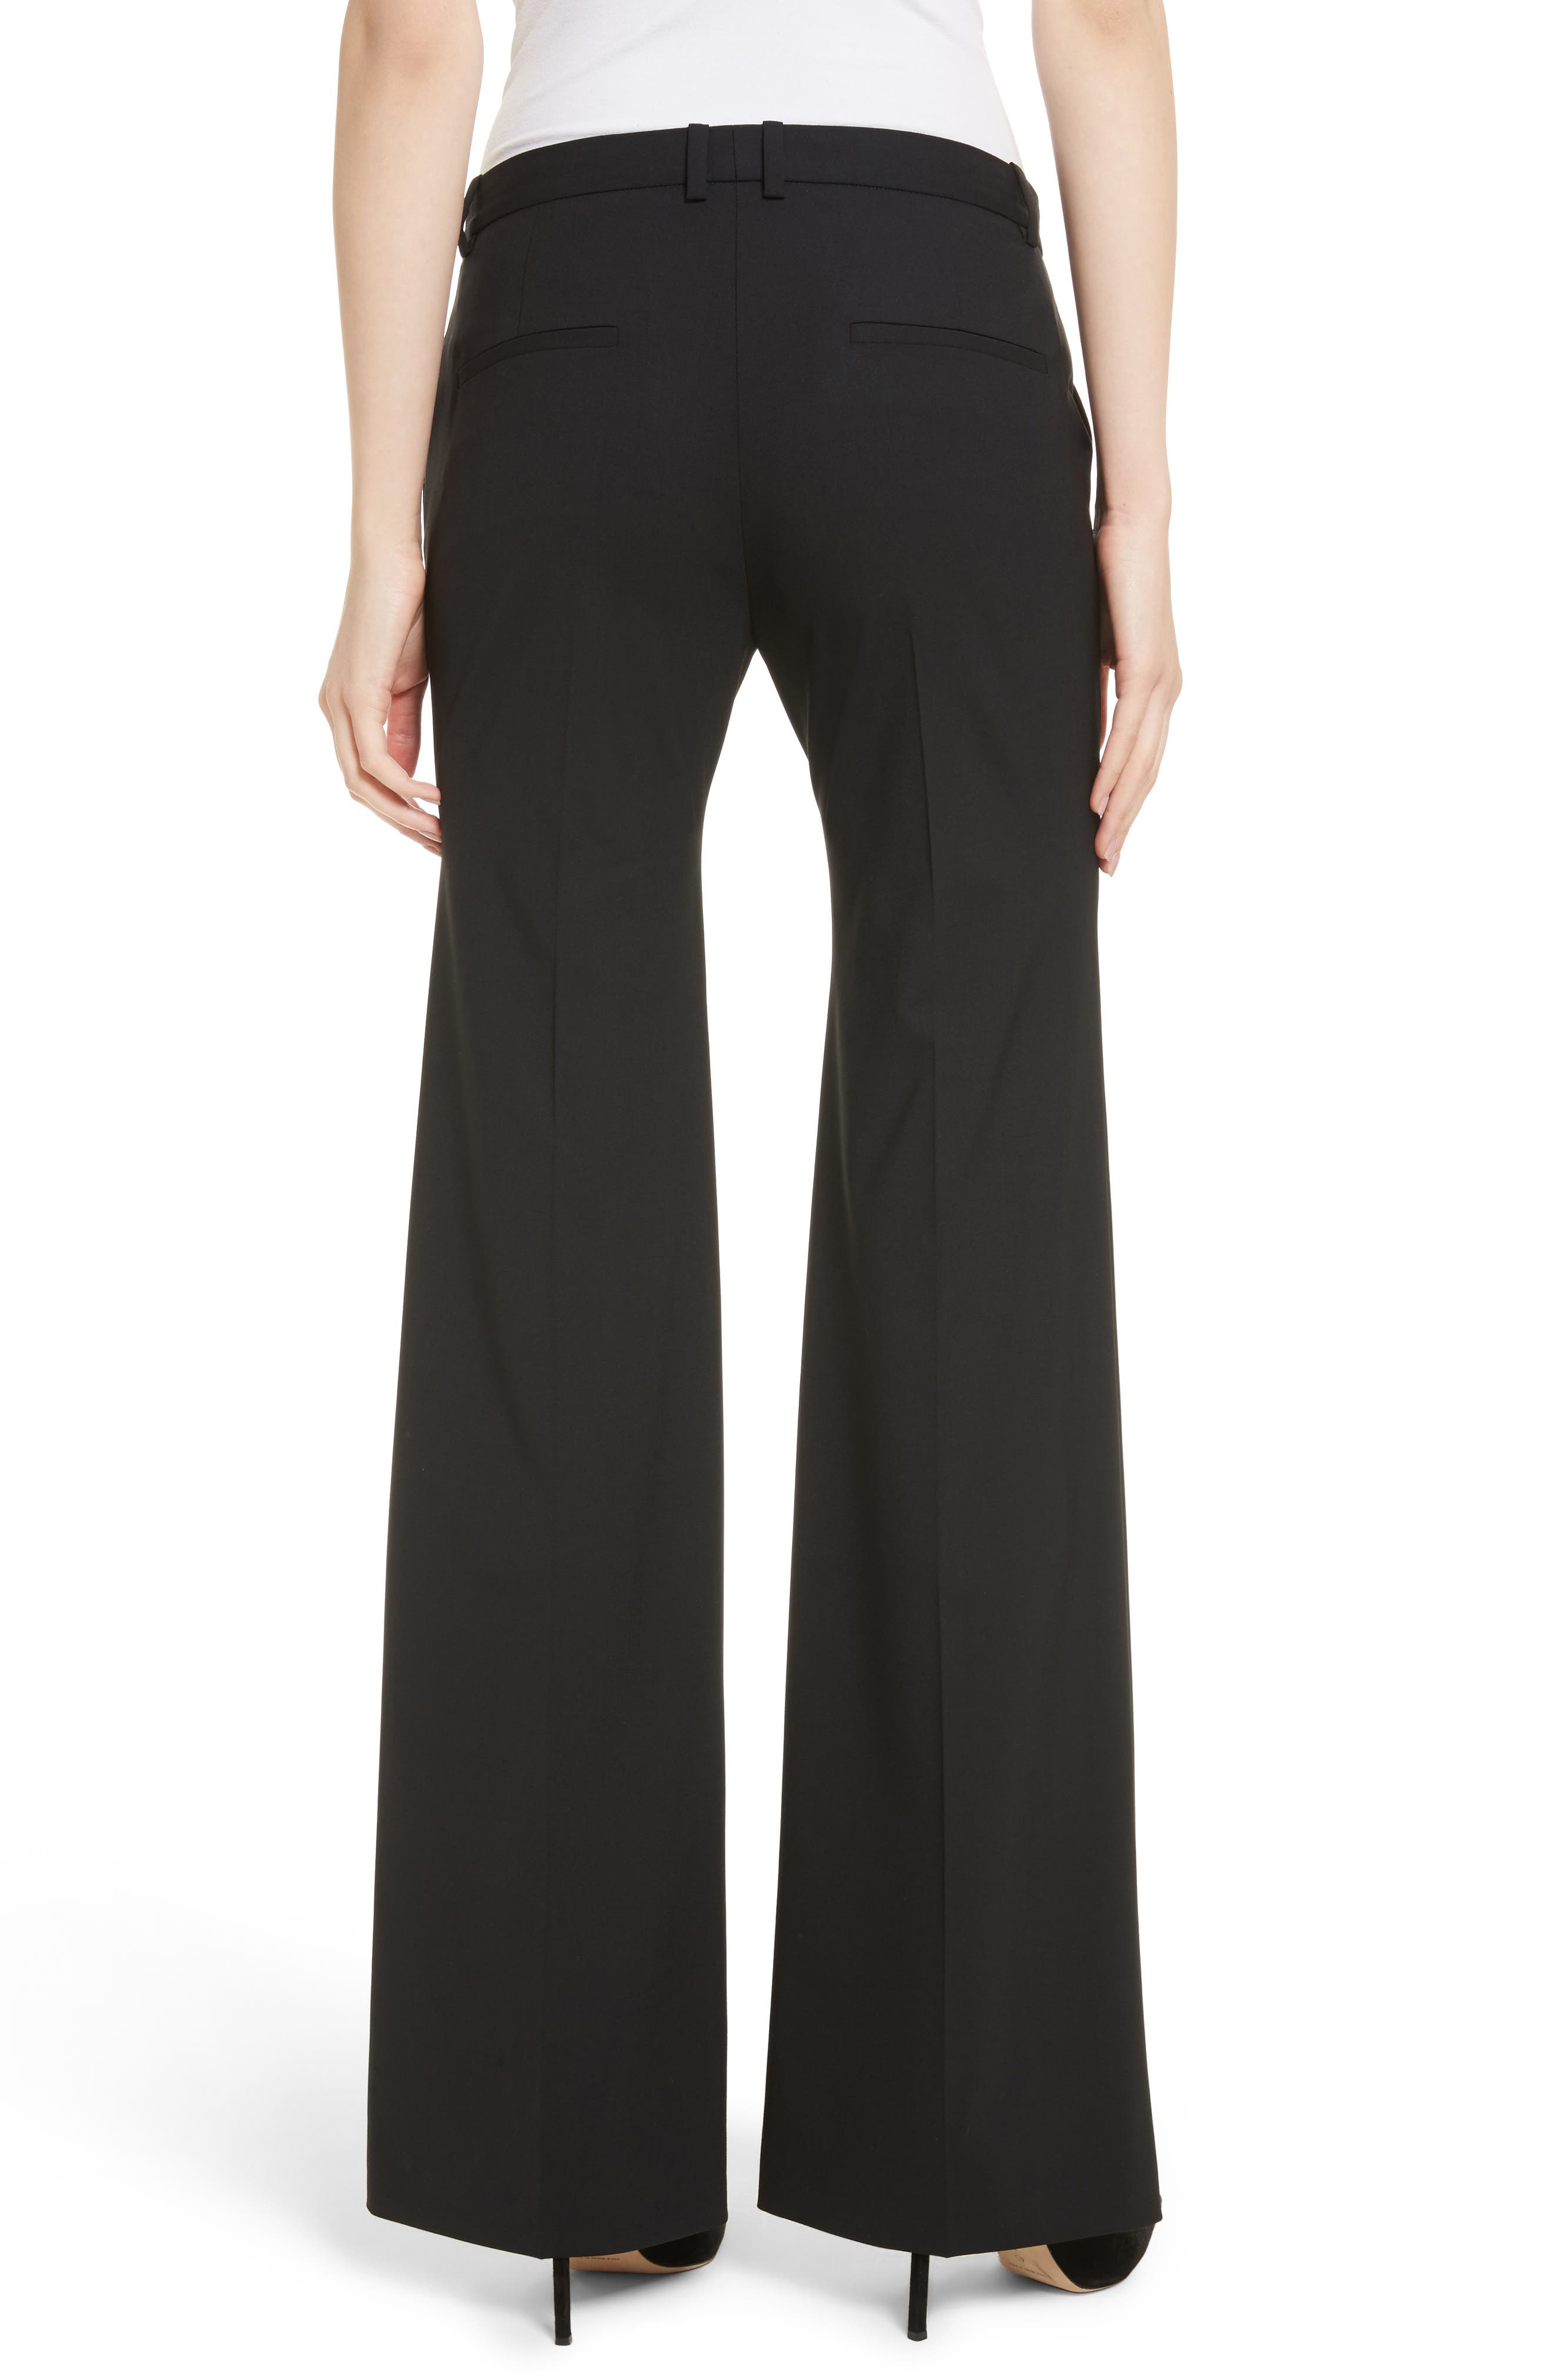 THEORY, Demetria 2 Flare Leg Good Wool Suit Pants, Alternate thumbnail 2, color, BLACK